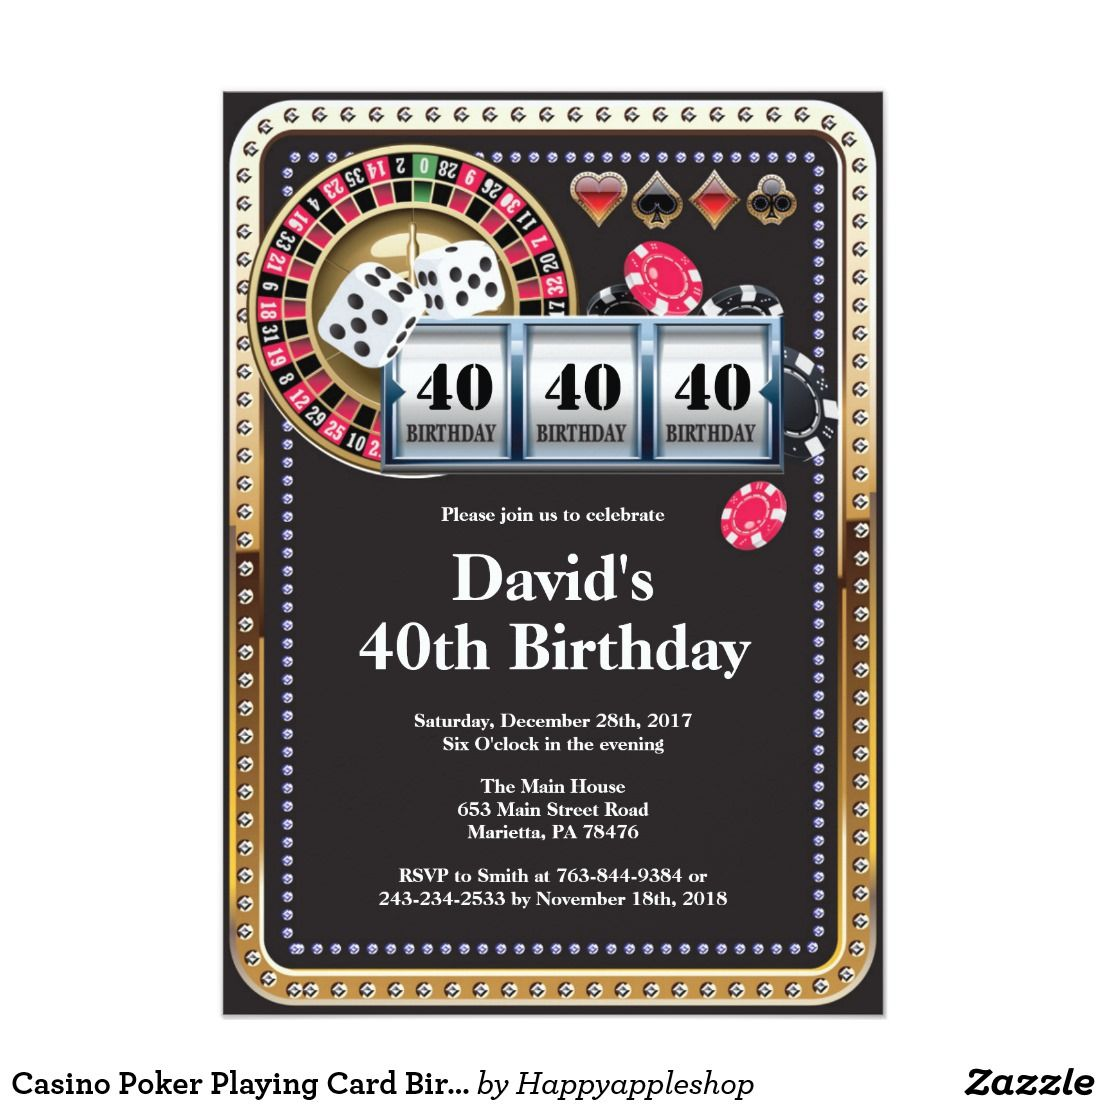 Casino poker playing card birthday invitation